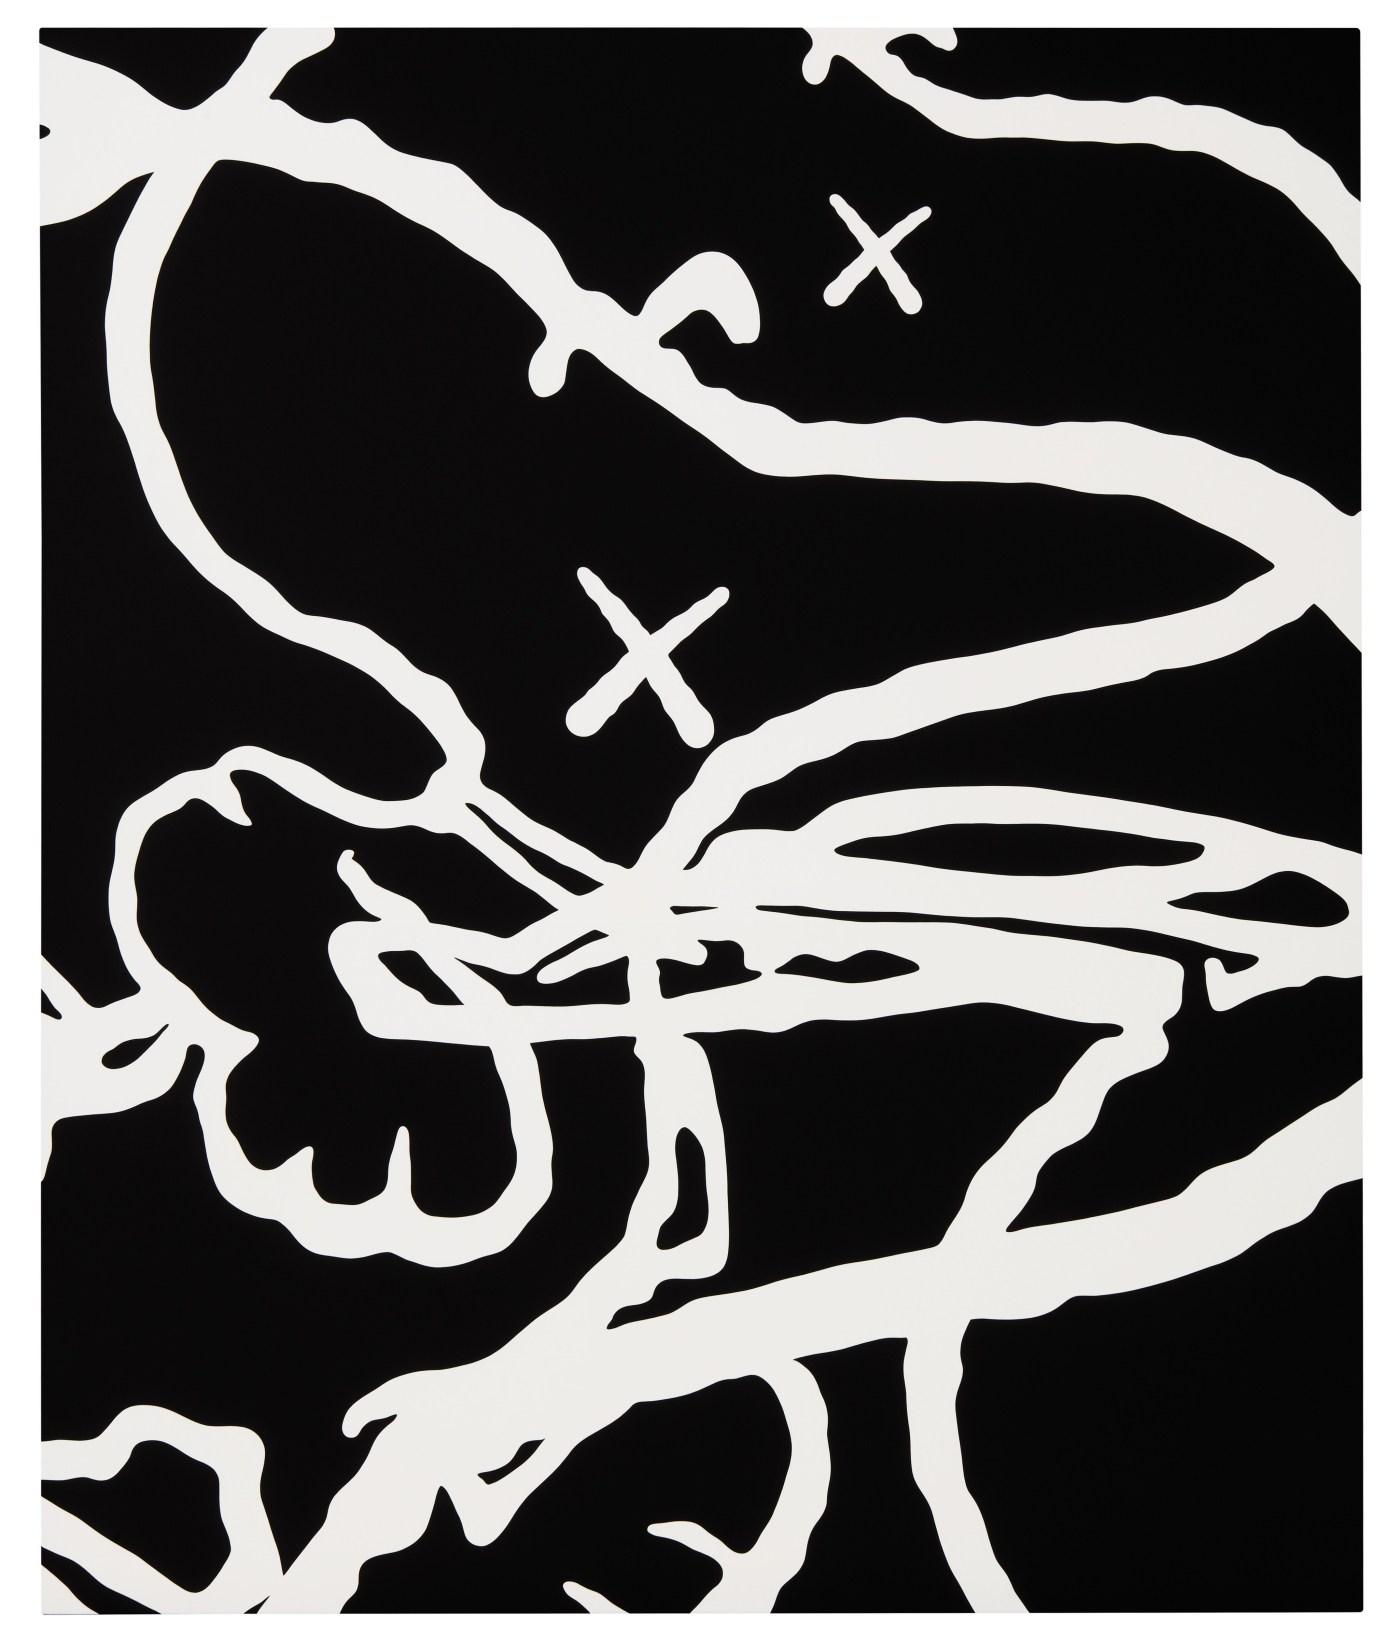 KAWS, Untitled (MBFT5), 2015